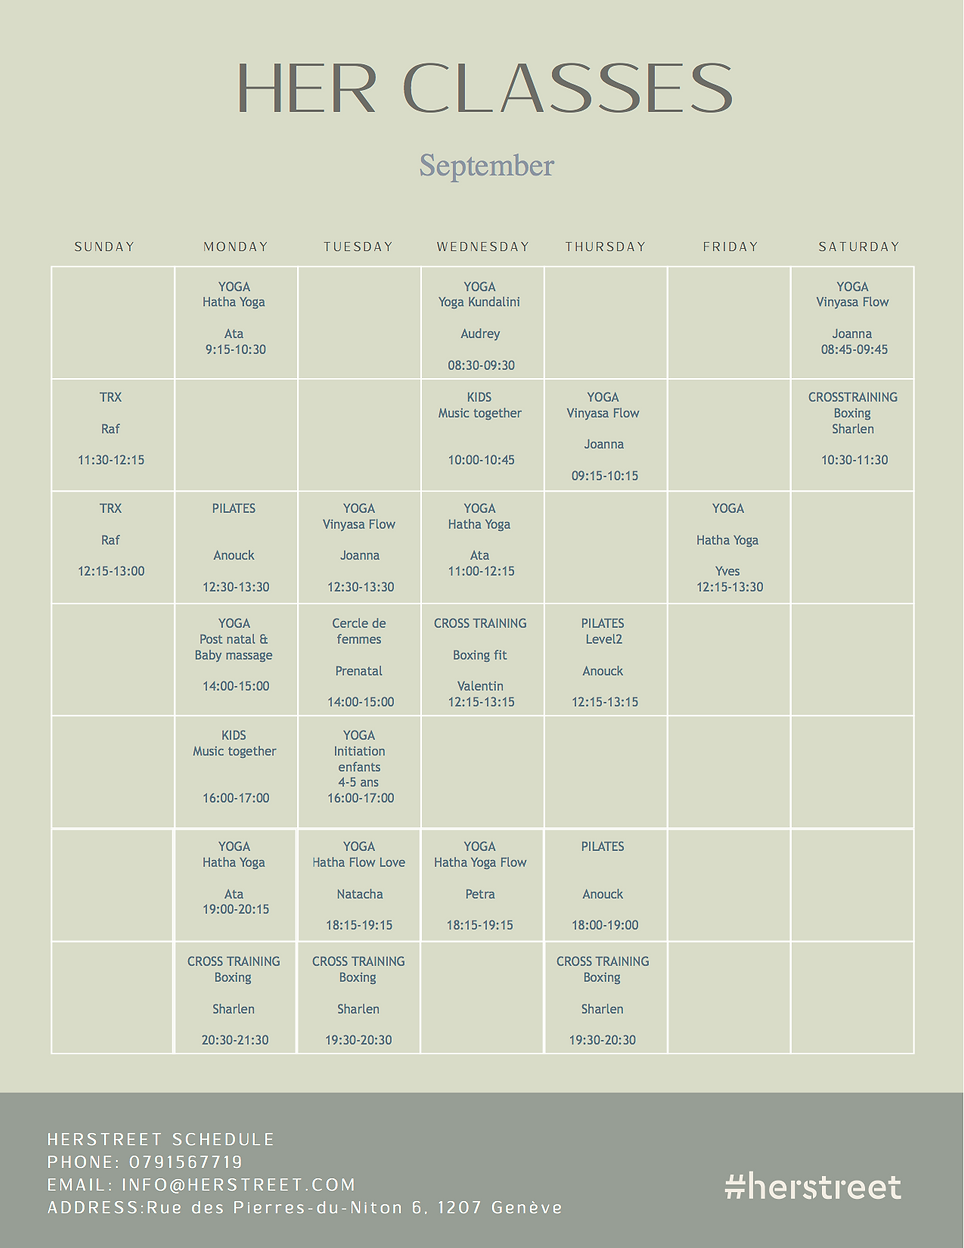 #herstreet_Her Classes Schedule_sep3.png